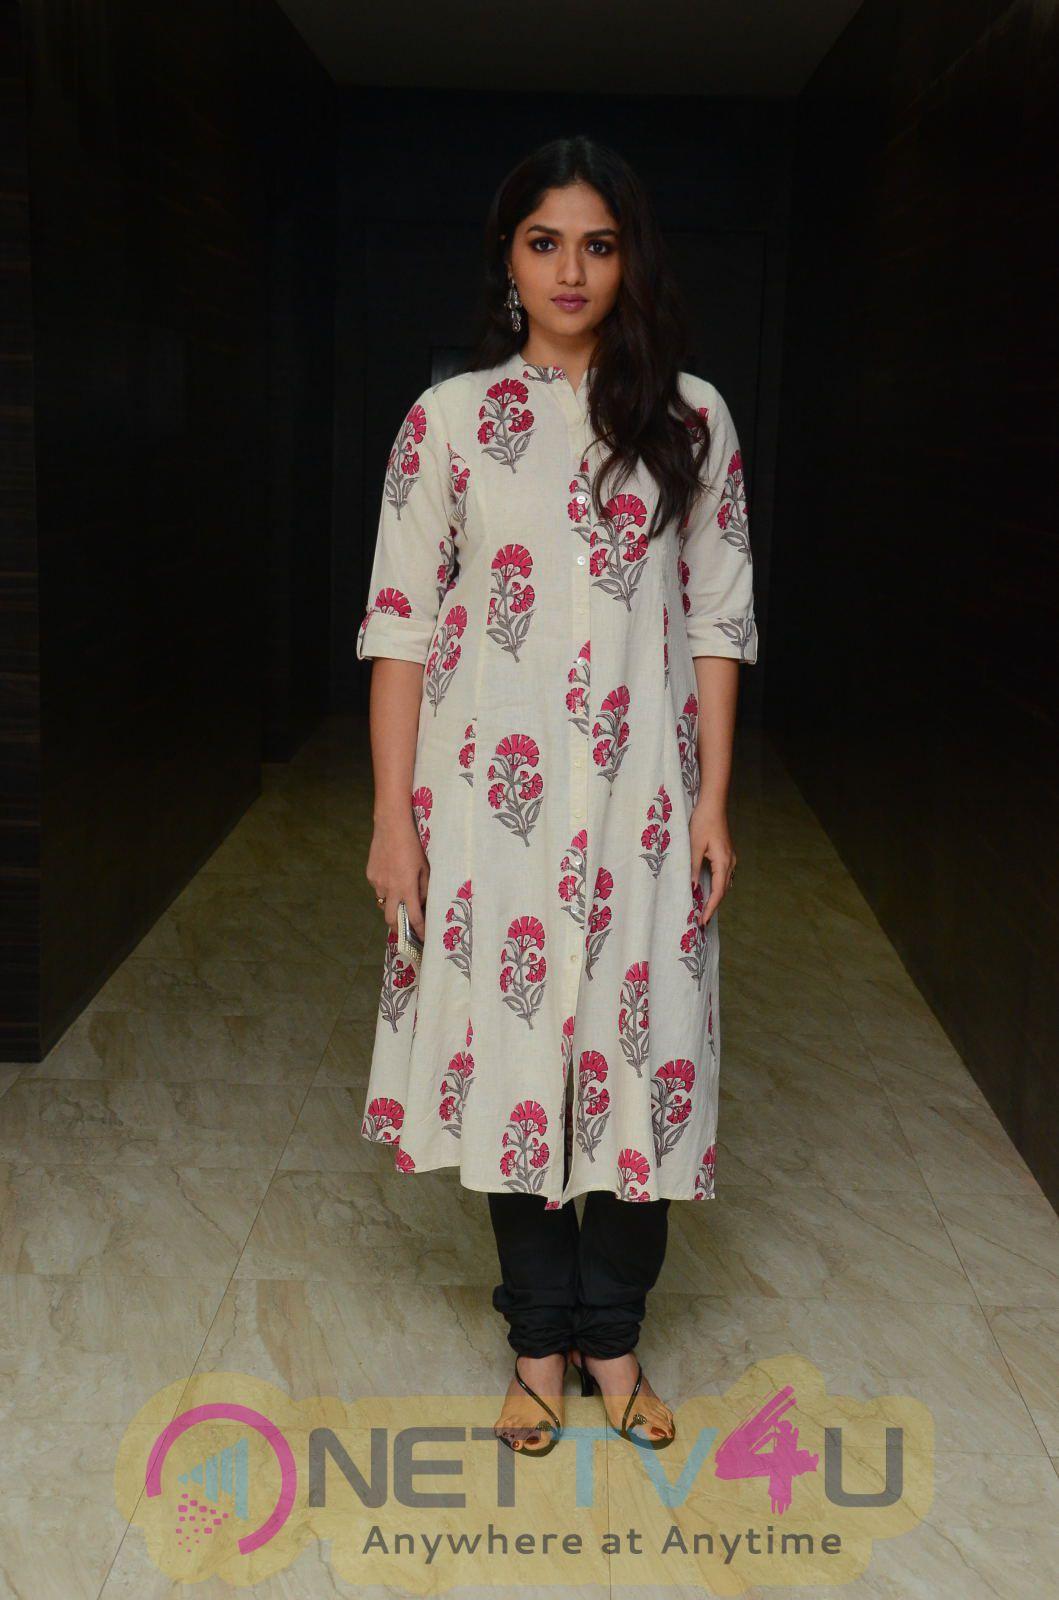 Sunaina Good Looking Photos